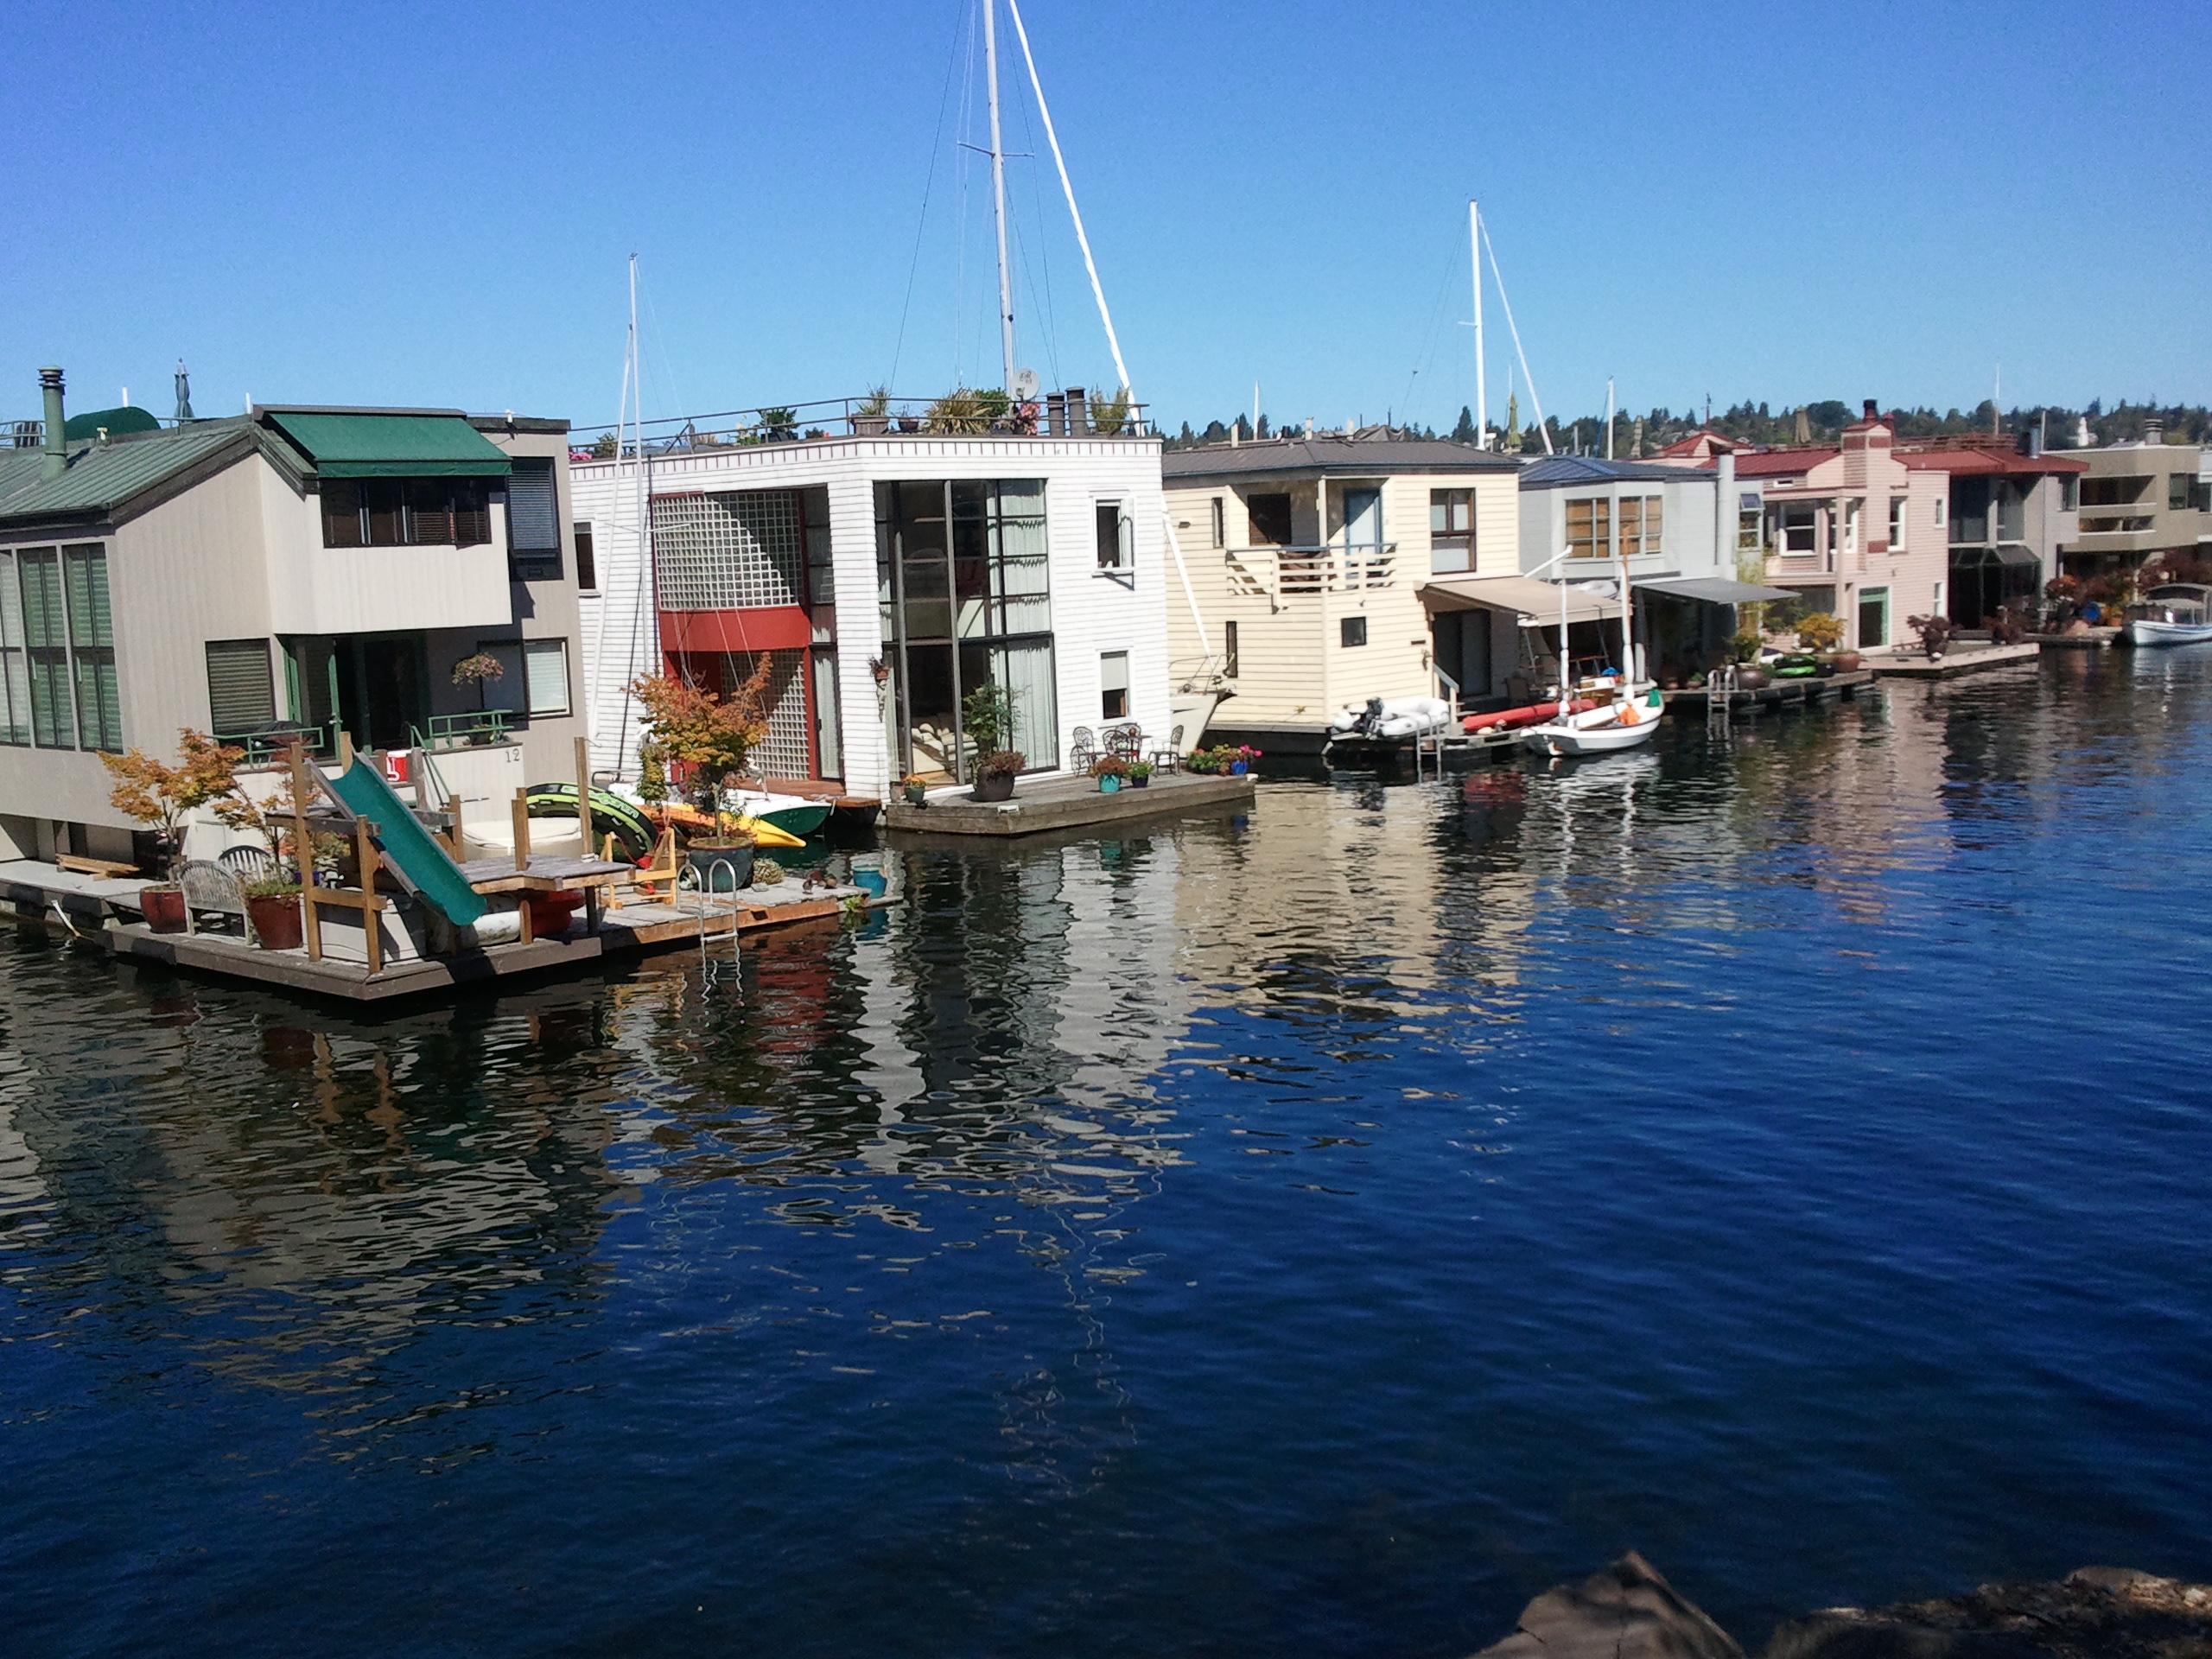 Roanoke reef floating homes seattle afloat seattle houseboats floating homes - Floating house seattle ...